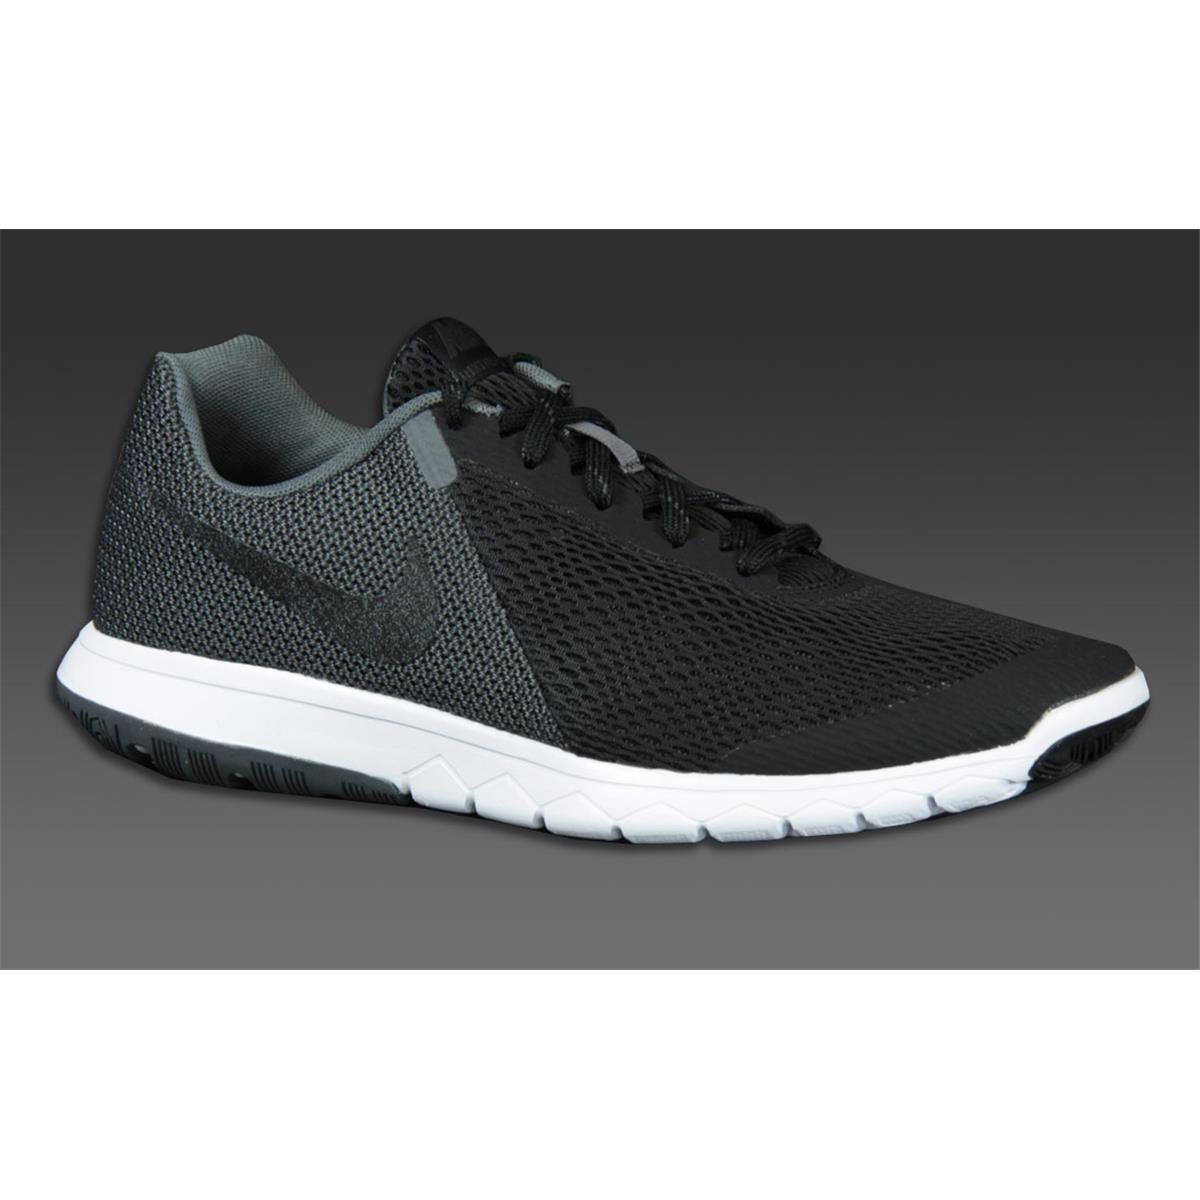 Nike Flex Experience RN 5 Mens Running